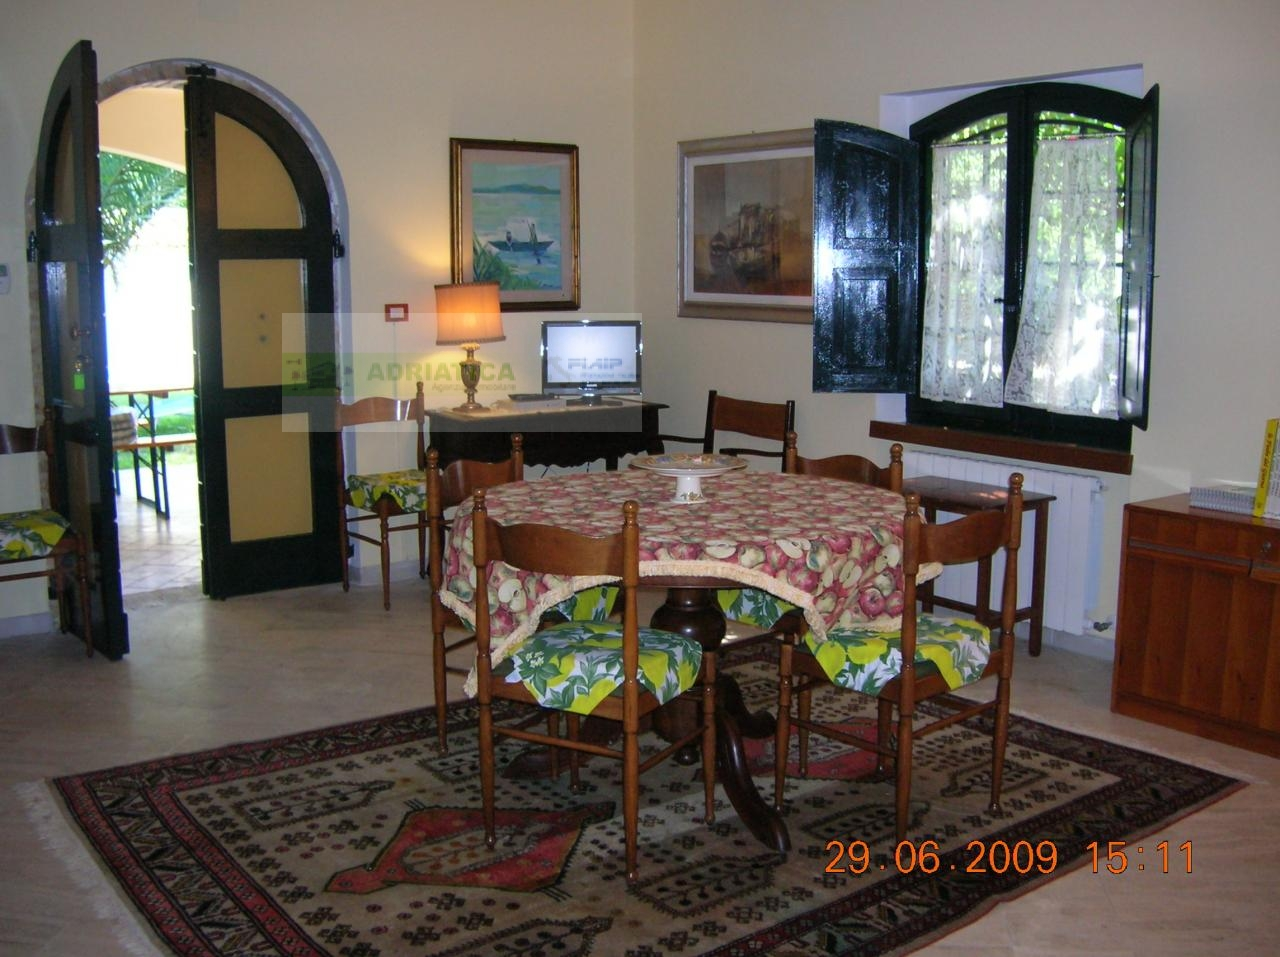 Villa in vendita a Cupra Marittima, 16 locali, Trattative riservate | CambioCasa.it